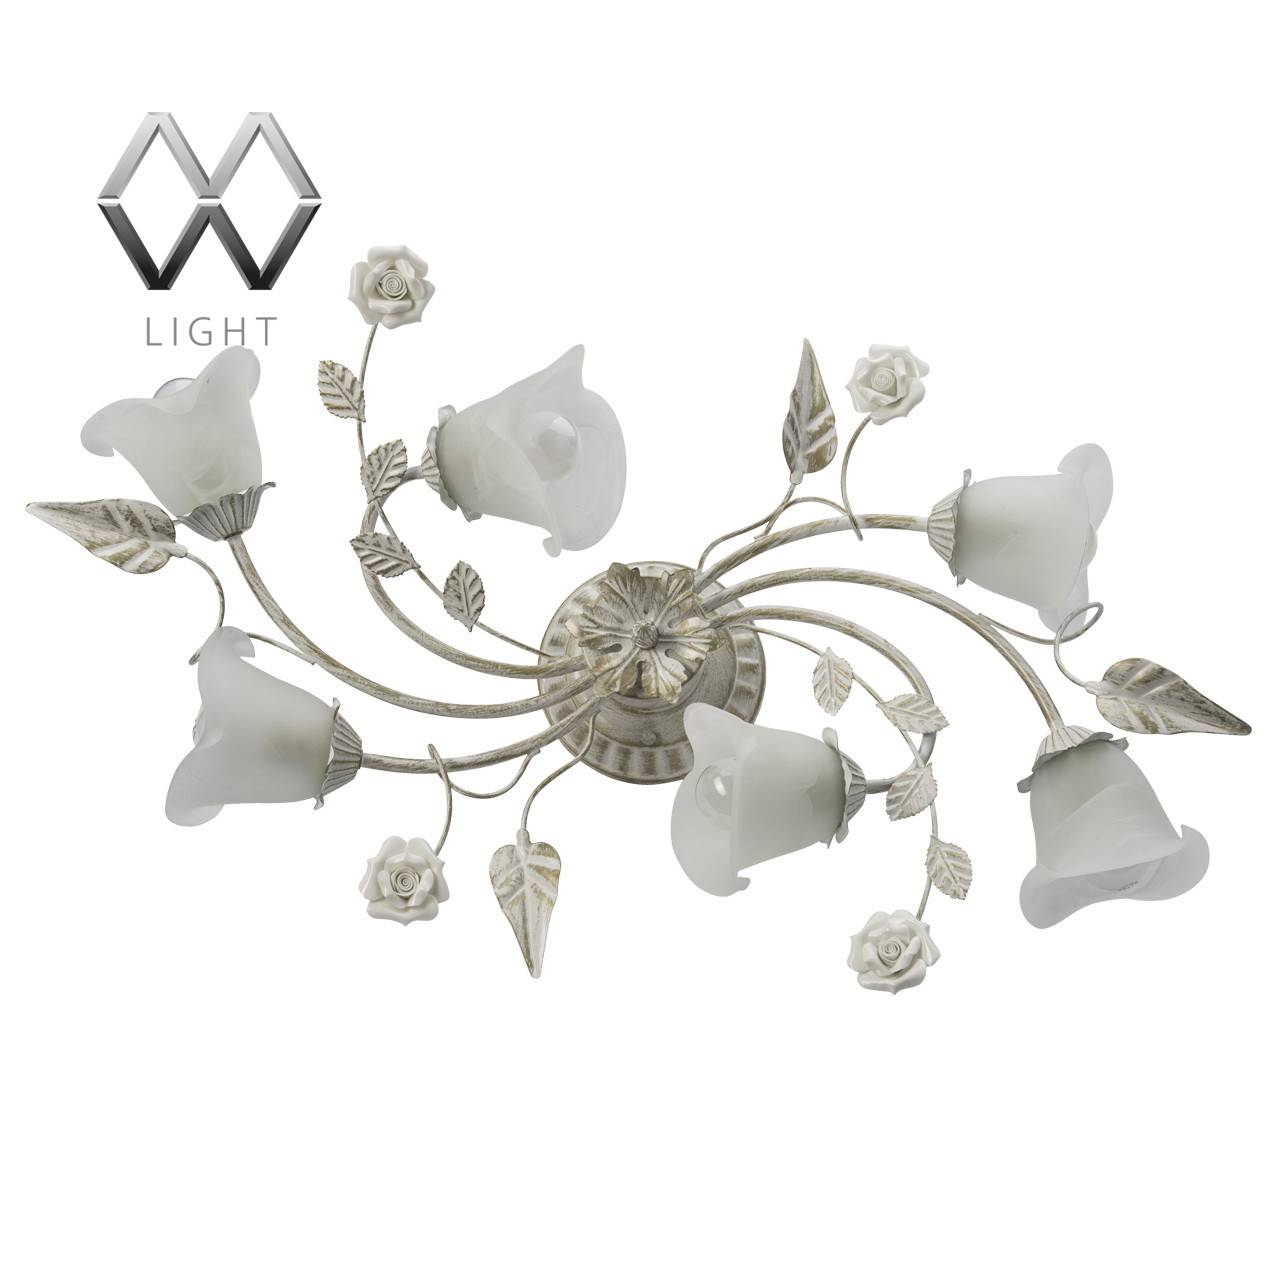 цена на Потолочная люстра MW-Light Восторг 242014806